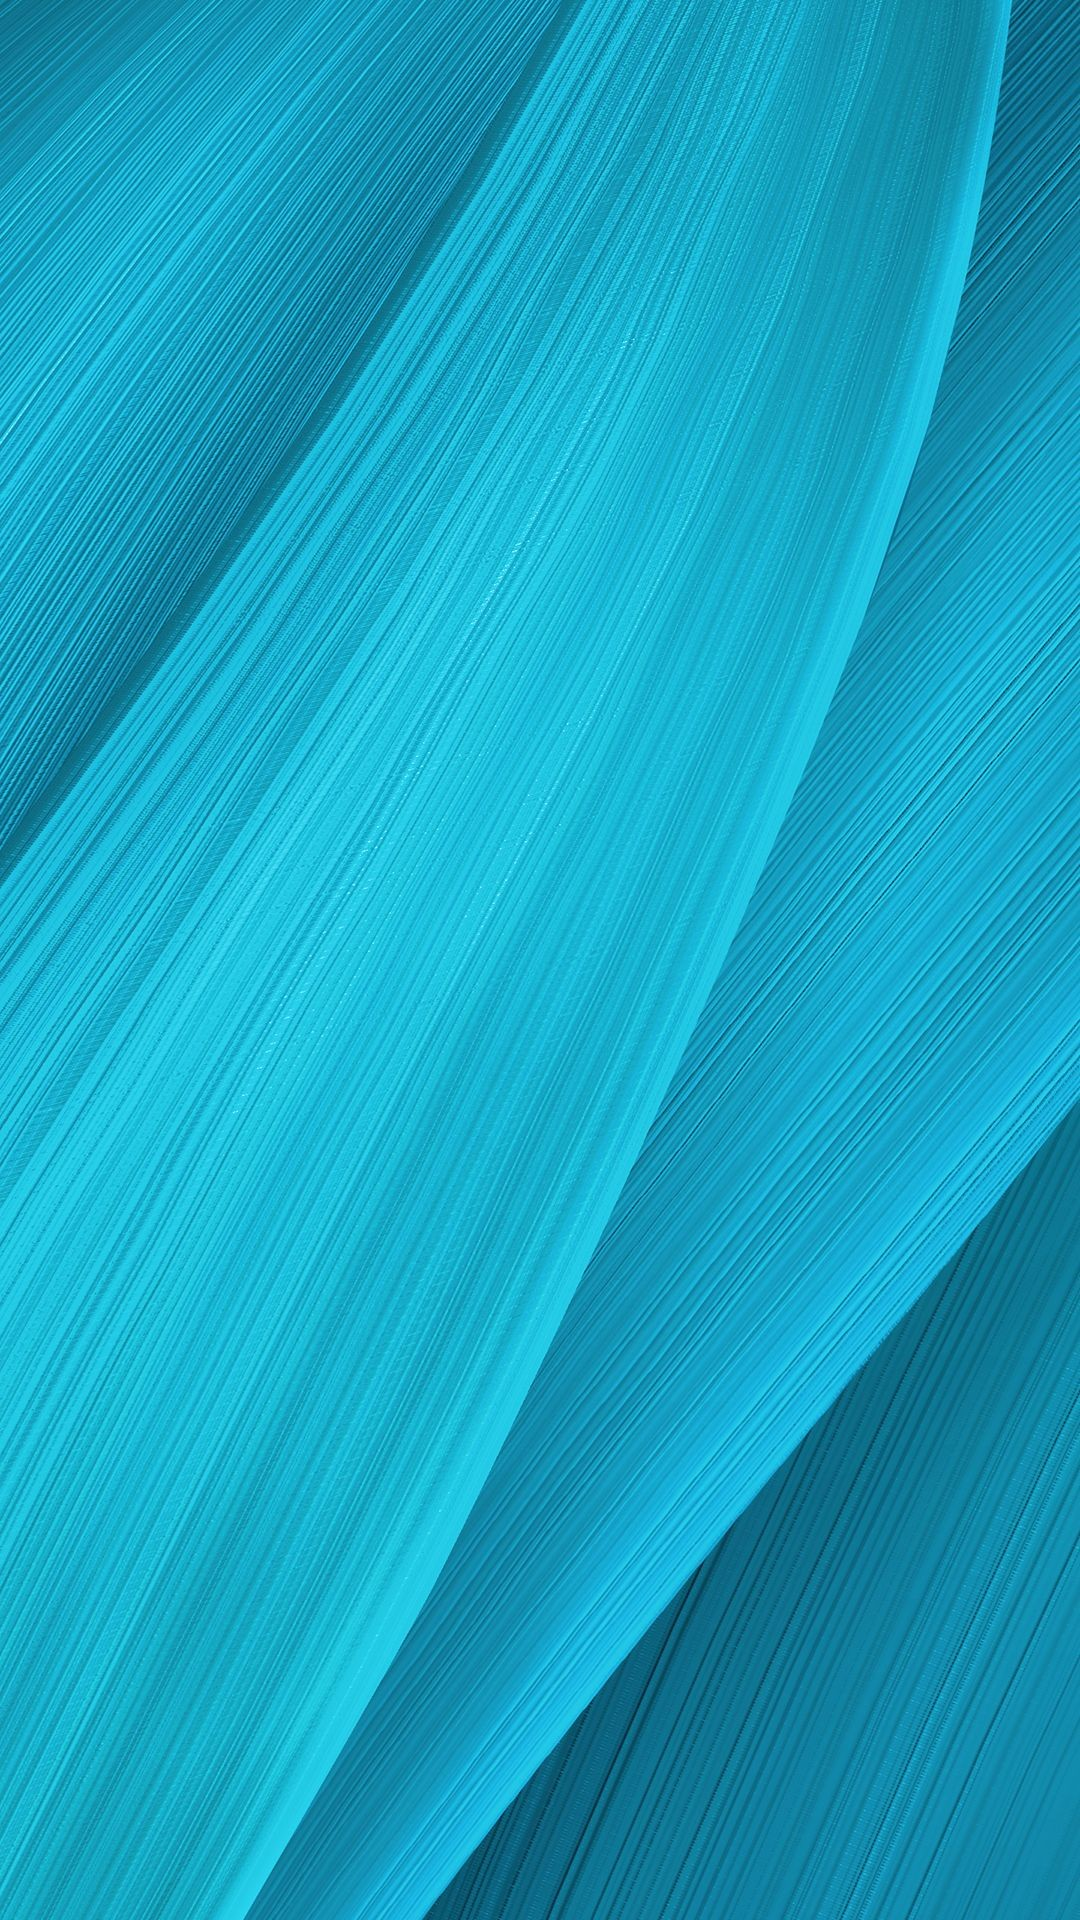 Asus Rog HD desktop wallpaper : Widescreen : High Definition 1024×600 Asus  Hd Wallpaper (40 Wallpapers)   Adorable Wallpapers   Wallpapers   Pinterest    Hd …